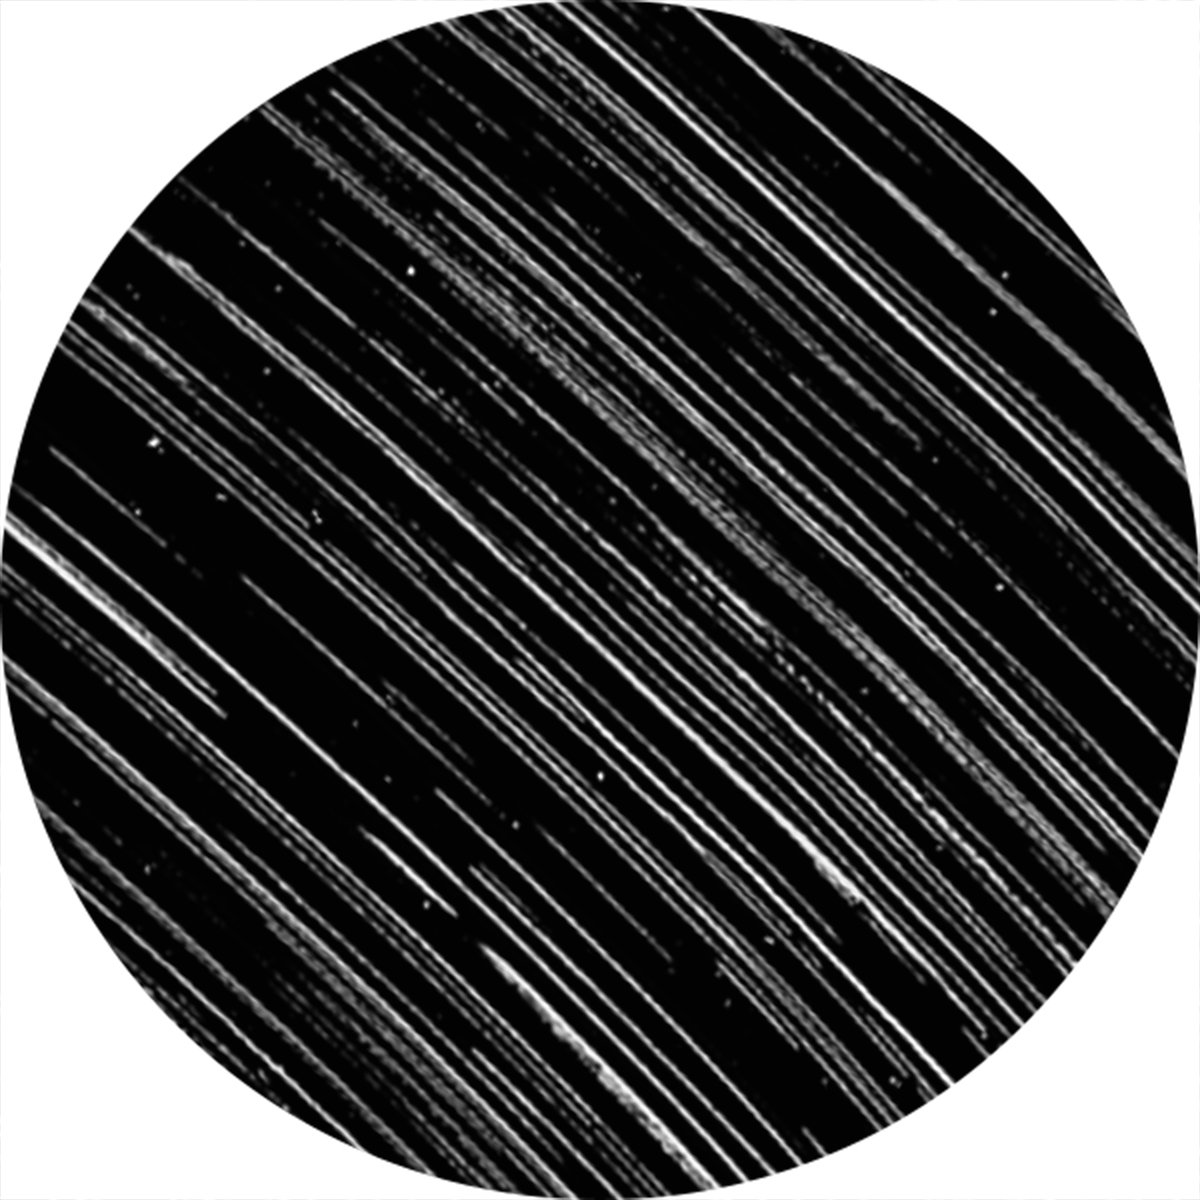 blinc Mascara Amplified, Black by blinc (Image #2)